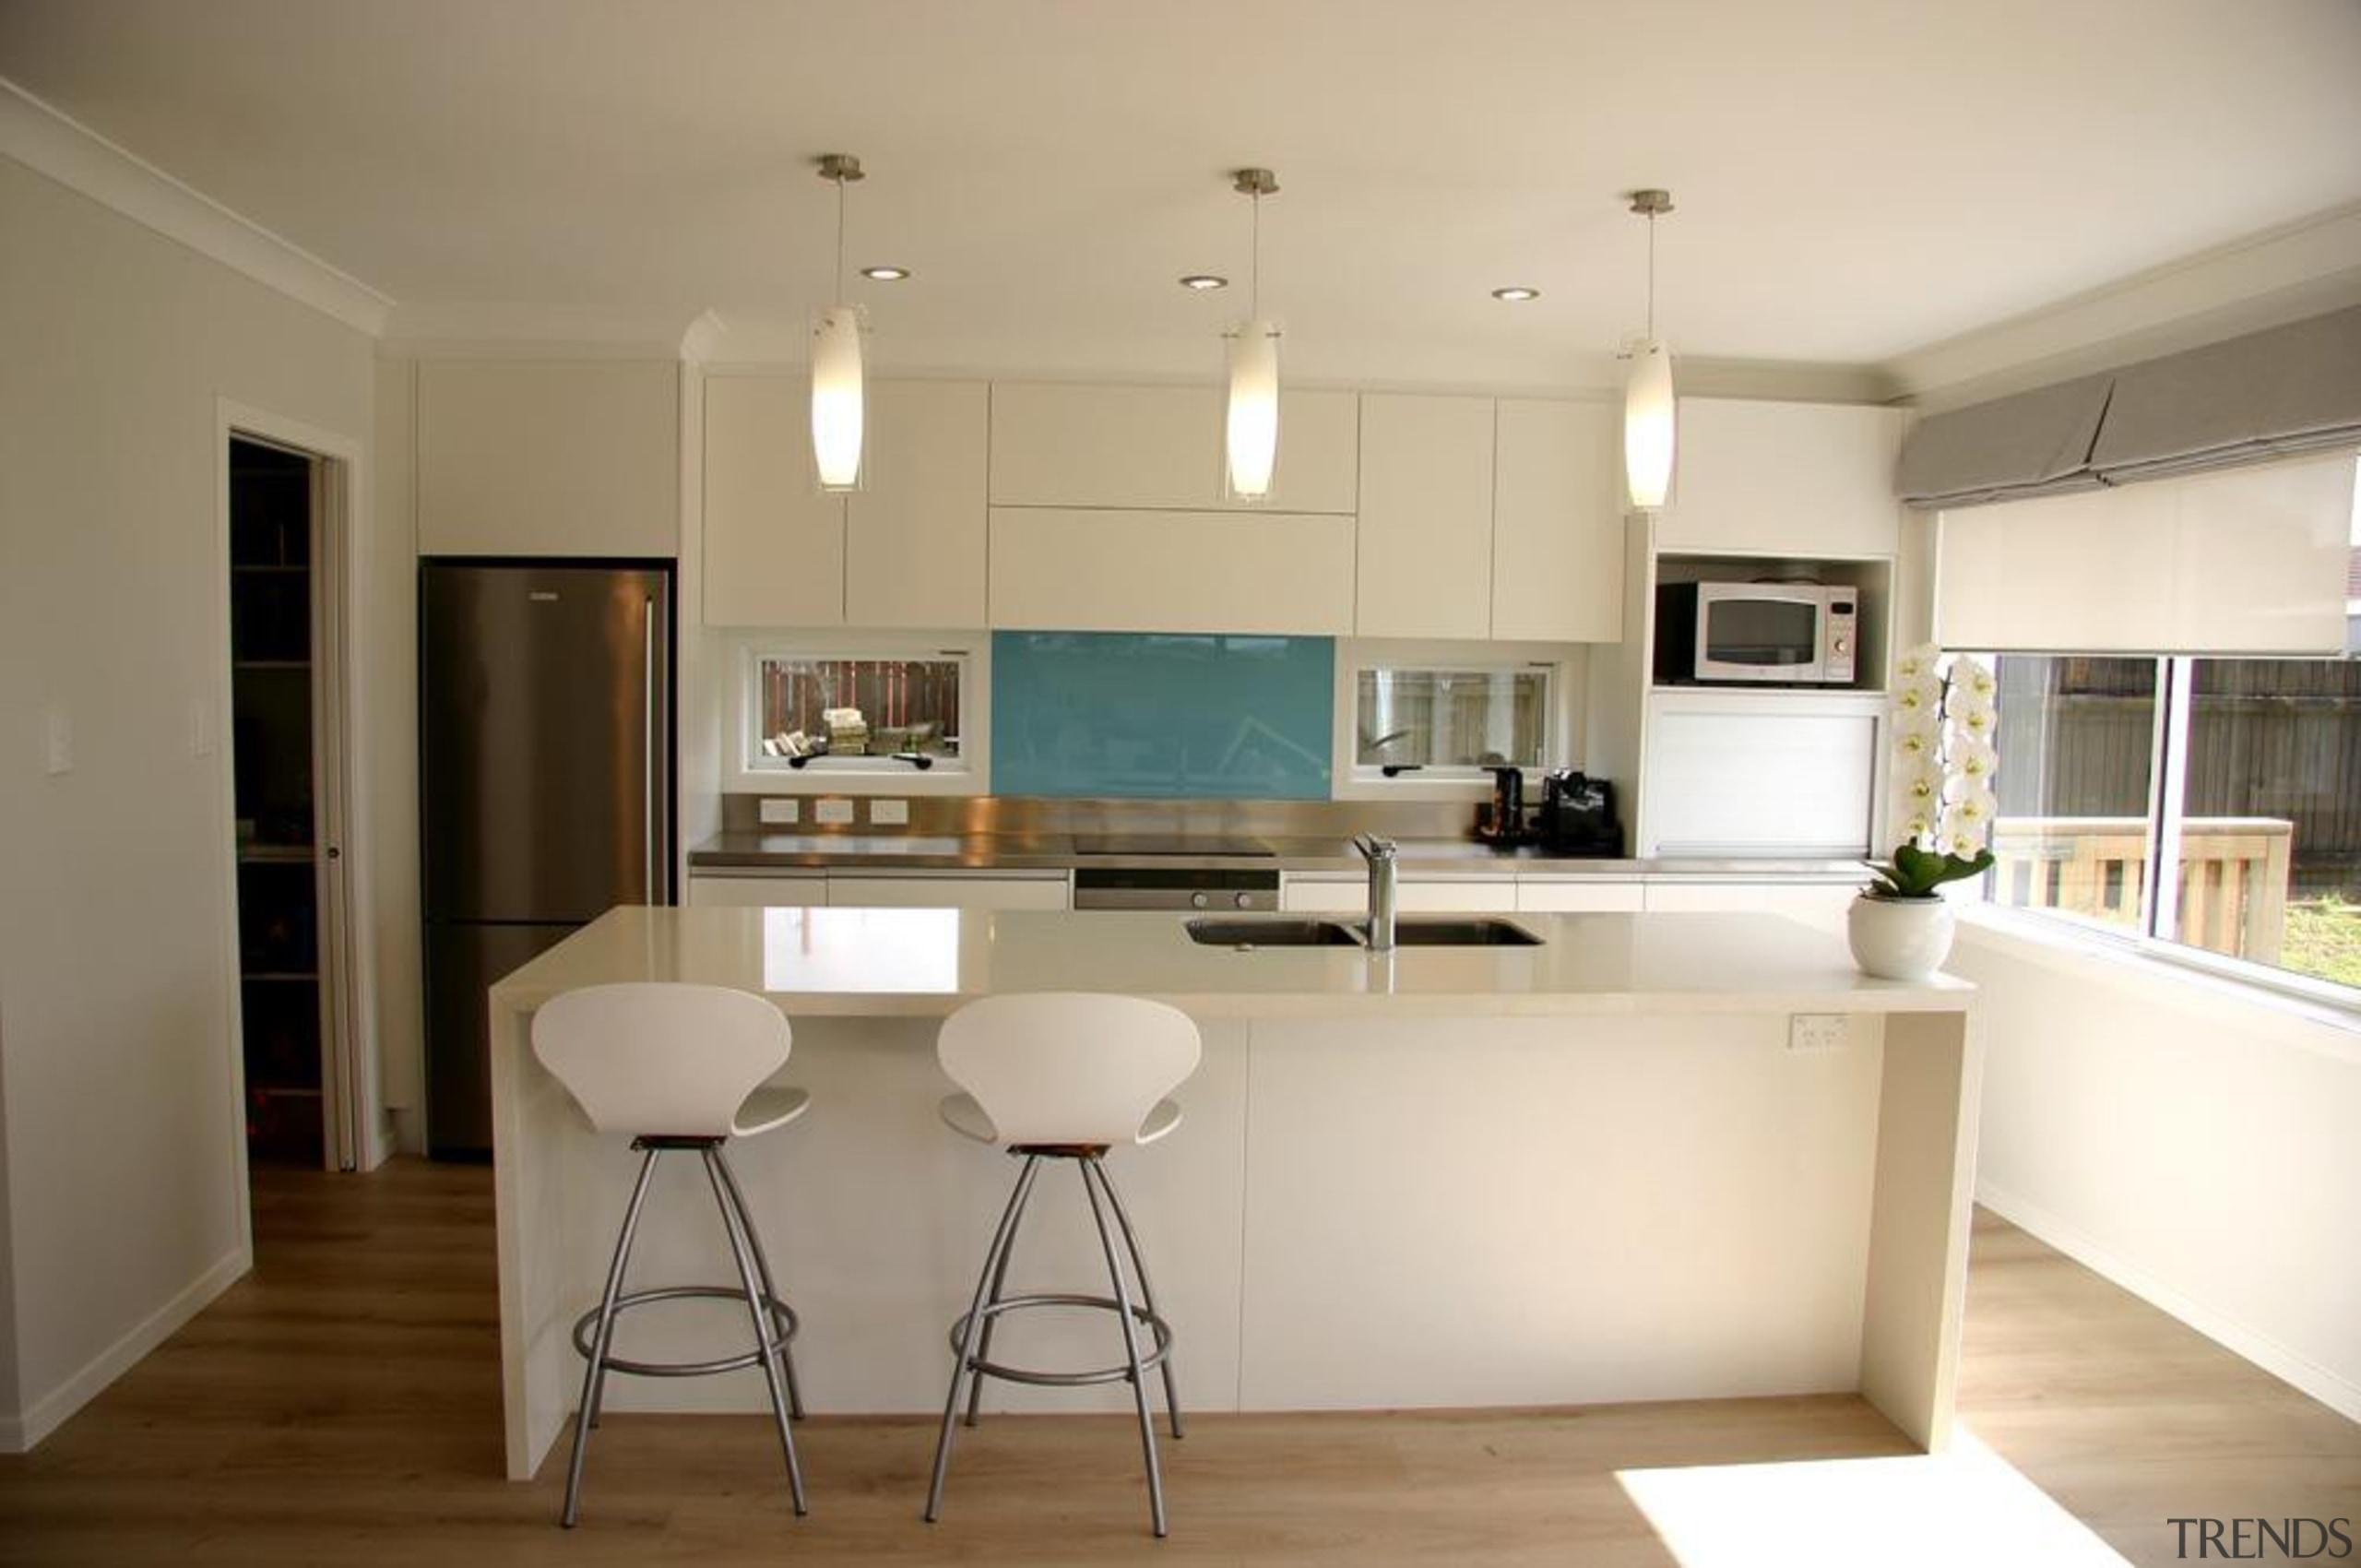 hillsborough modern 2013 2.jpg - hillsborough_modern_2013_2.jpg - countertop countertop, cuisine classique, floor, home, interior design, kitchen, real estate, room, gray, brown